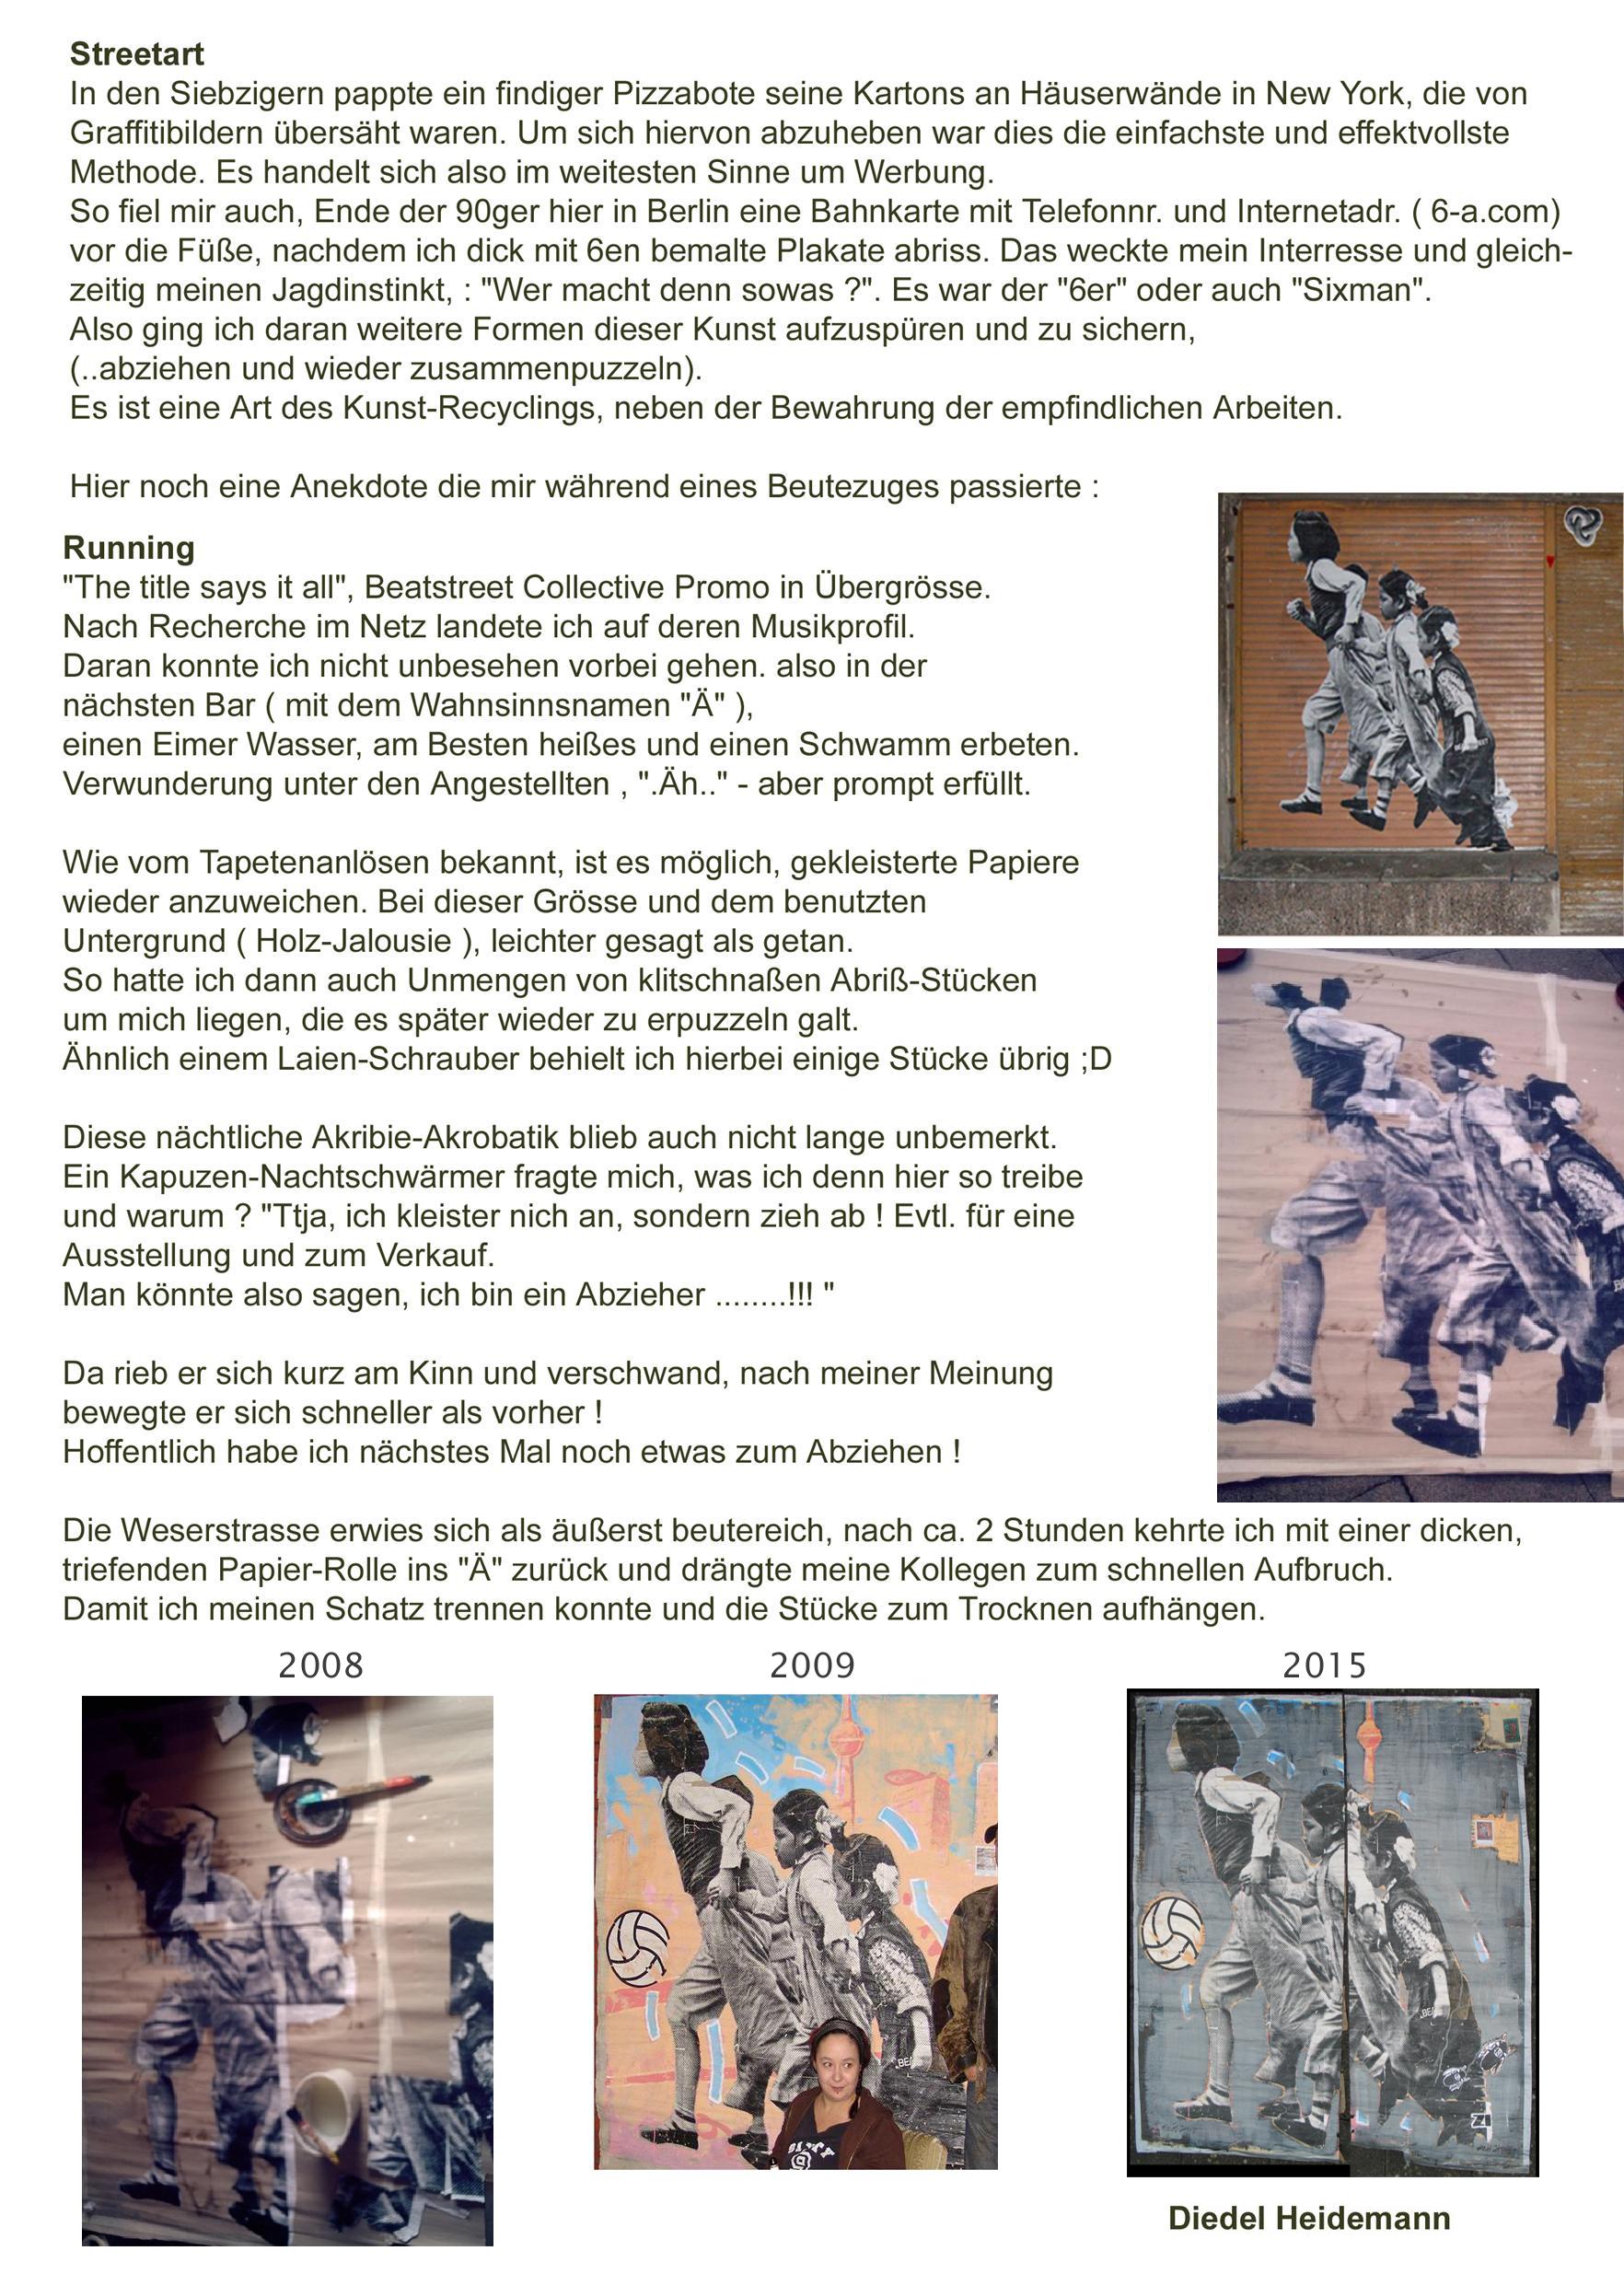 streetart info